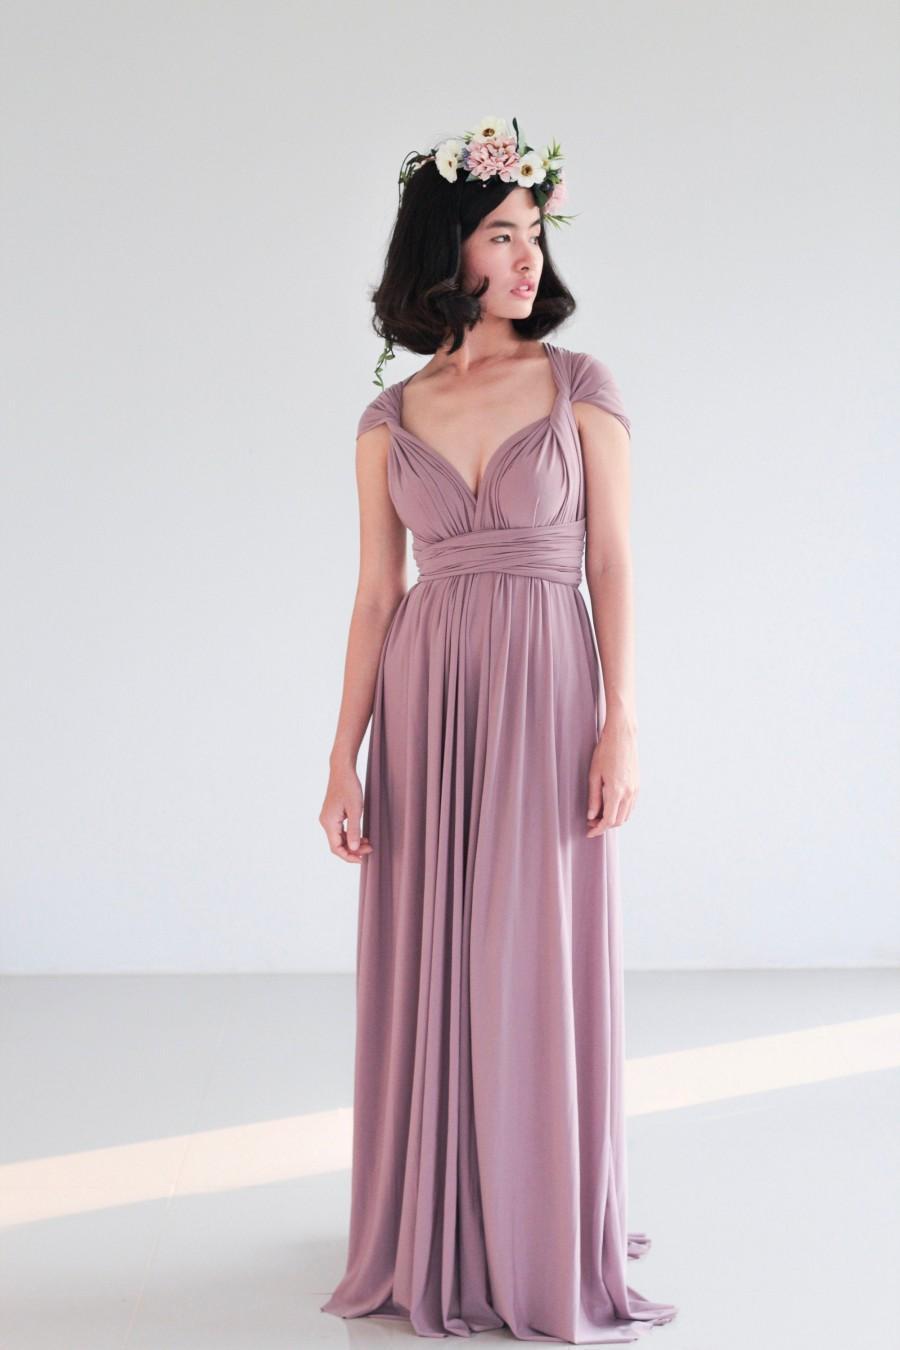 Hochzeit - Infinity Dress, Mauve purple Infinity Dress, Bridesmaid Dress, Prom Dress, Convertible Dress, Wrap Dress